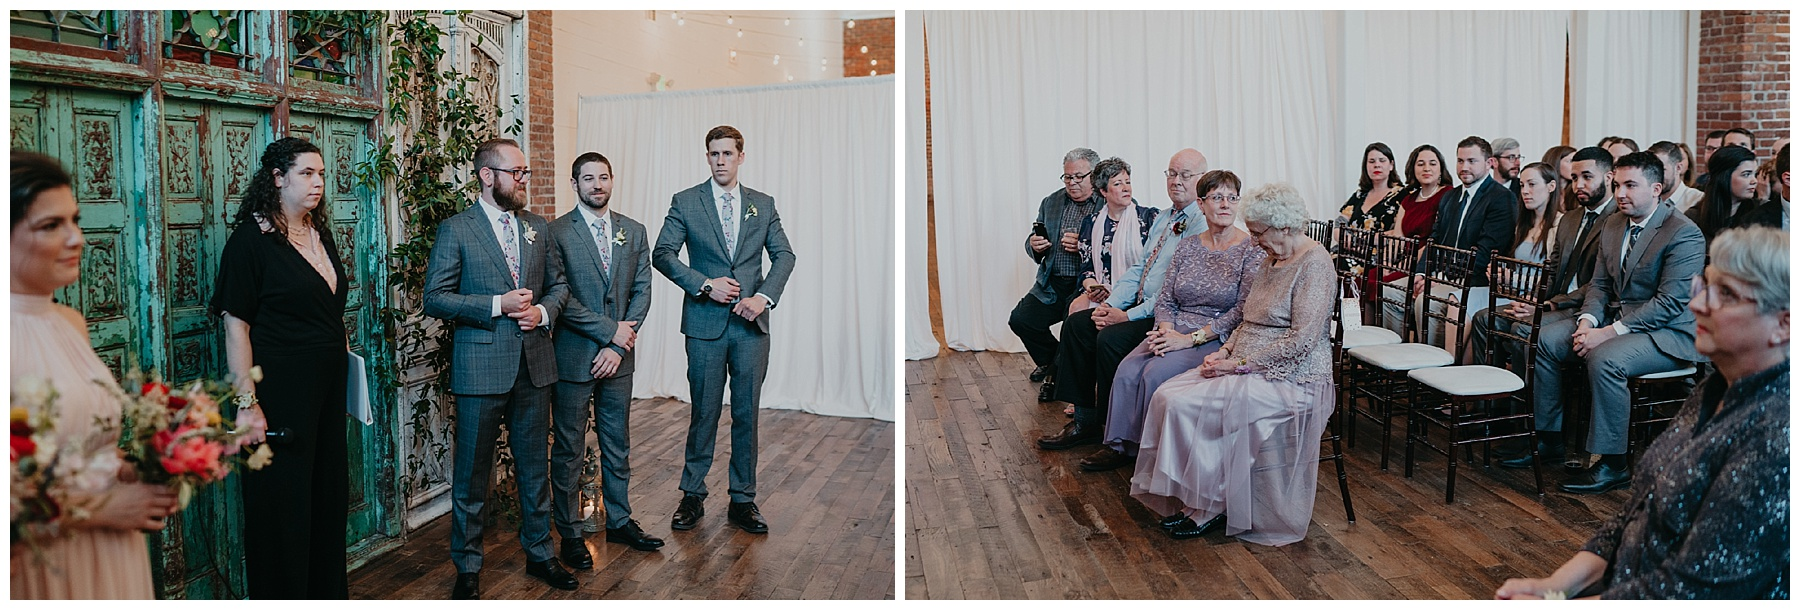 the_ravington_wedding_arkansas_0044.jpg